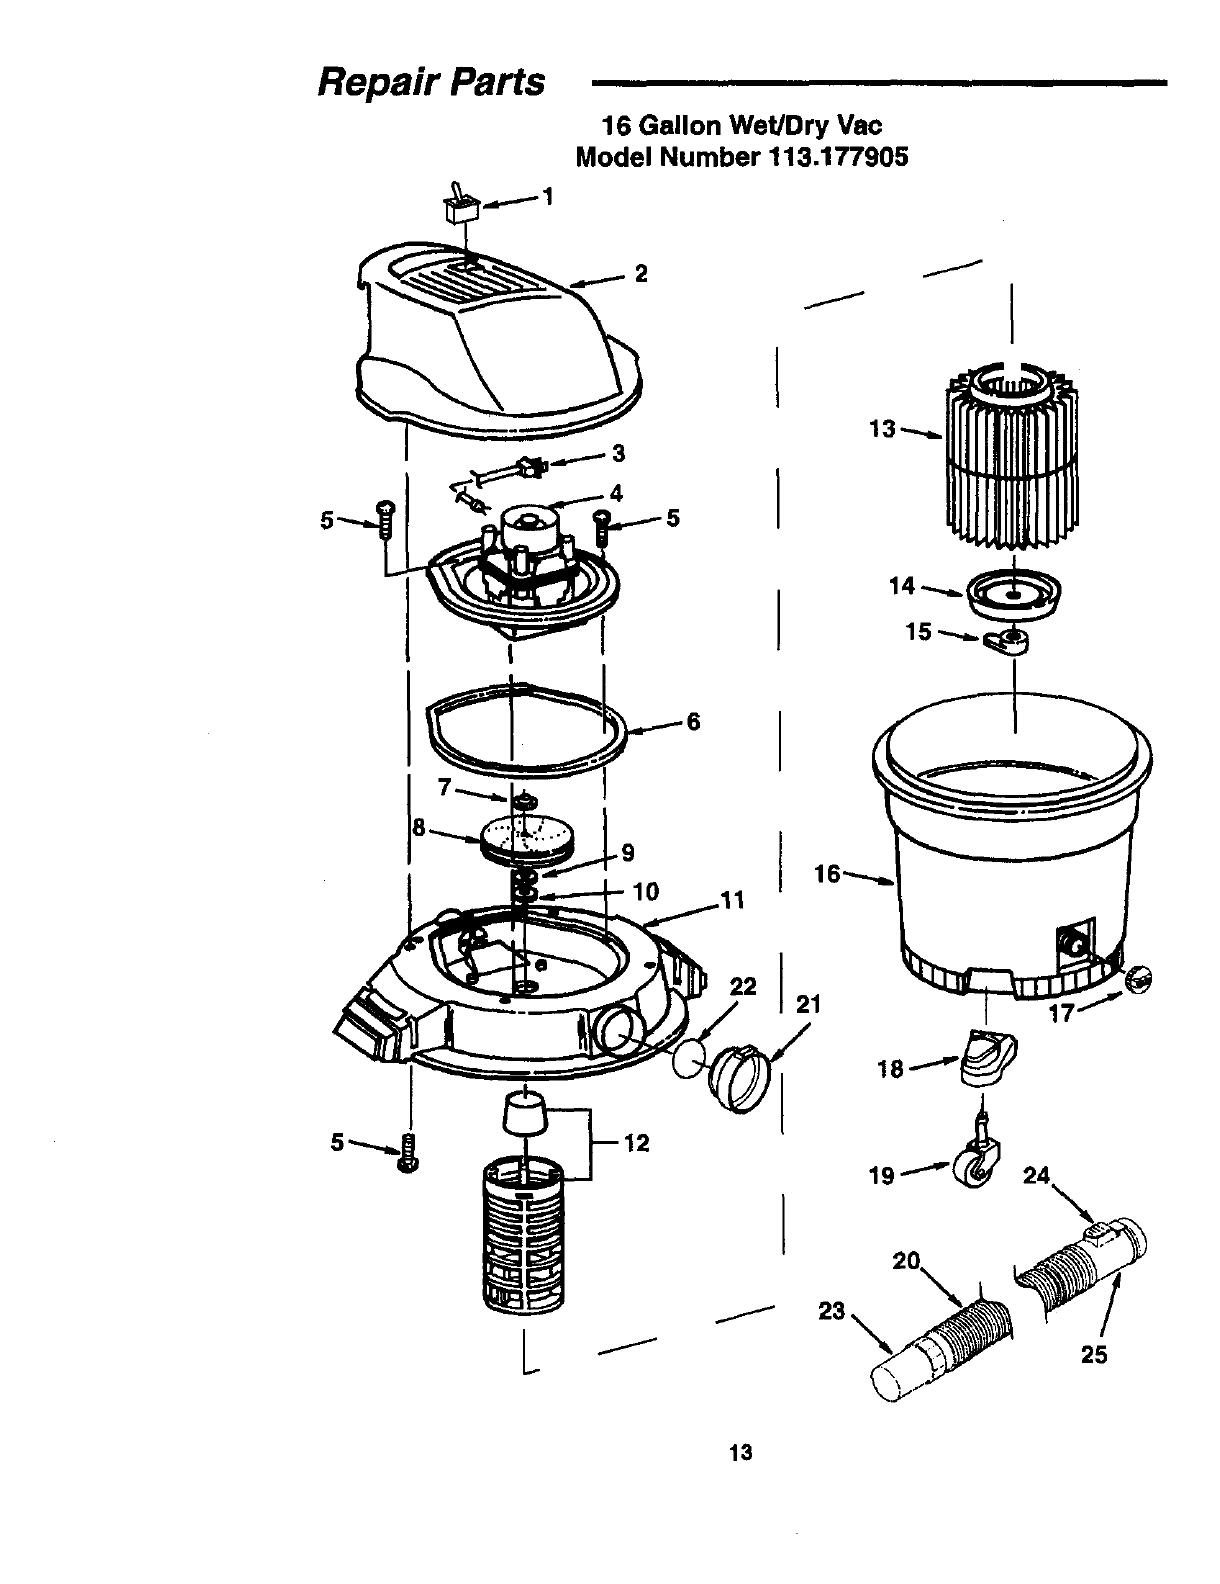 Craftsman 113177905 User Manual WET/DRY VAC Manuals And